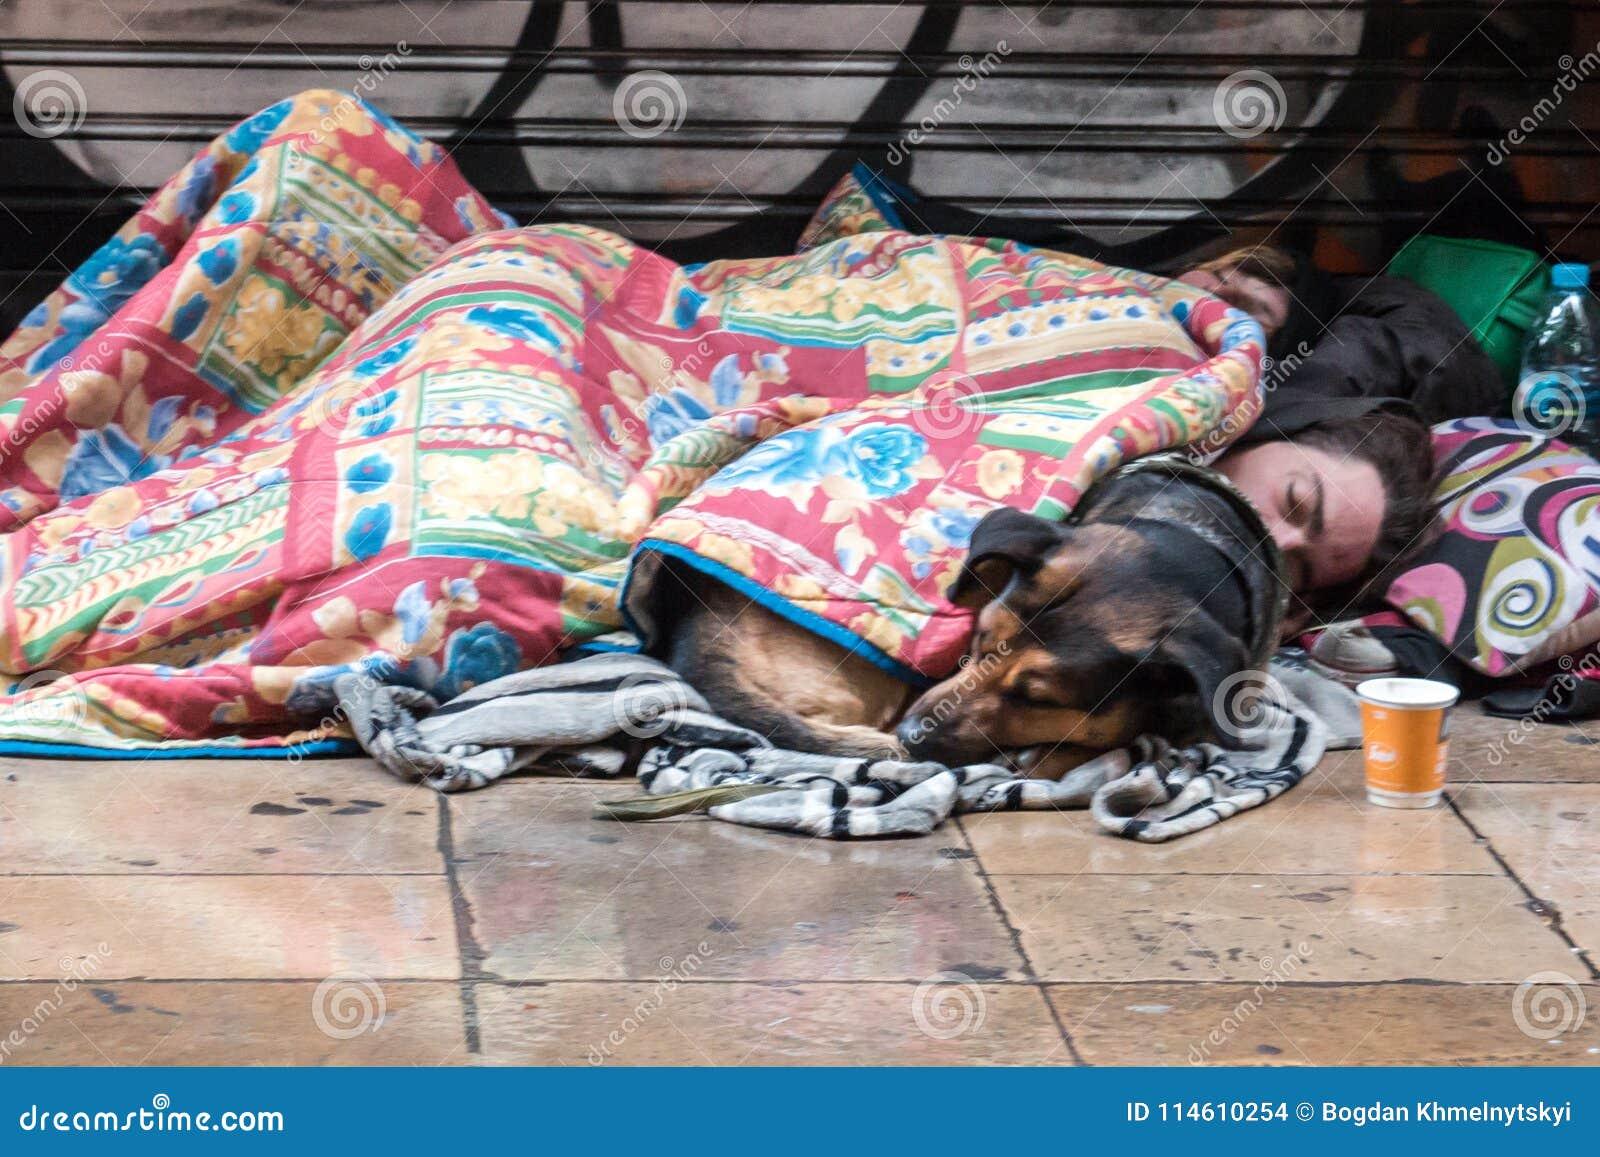 BARCELONA, SPAIN, February 4, 2018 A young homeless guy, a girl